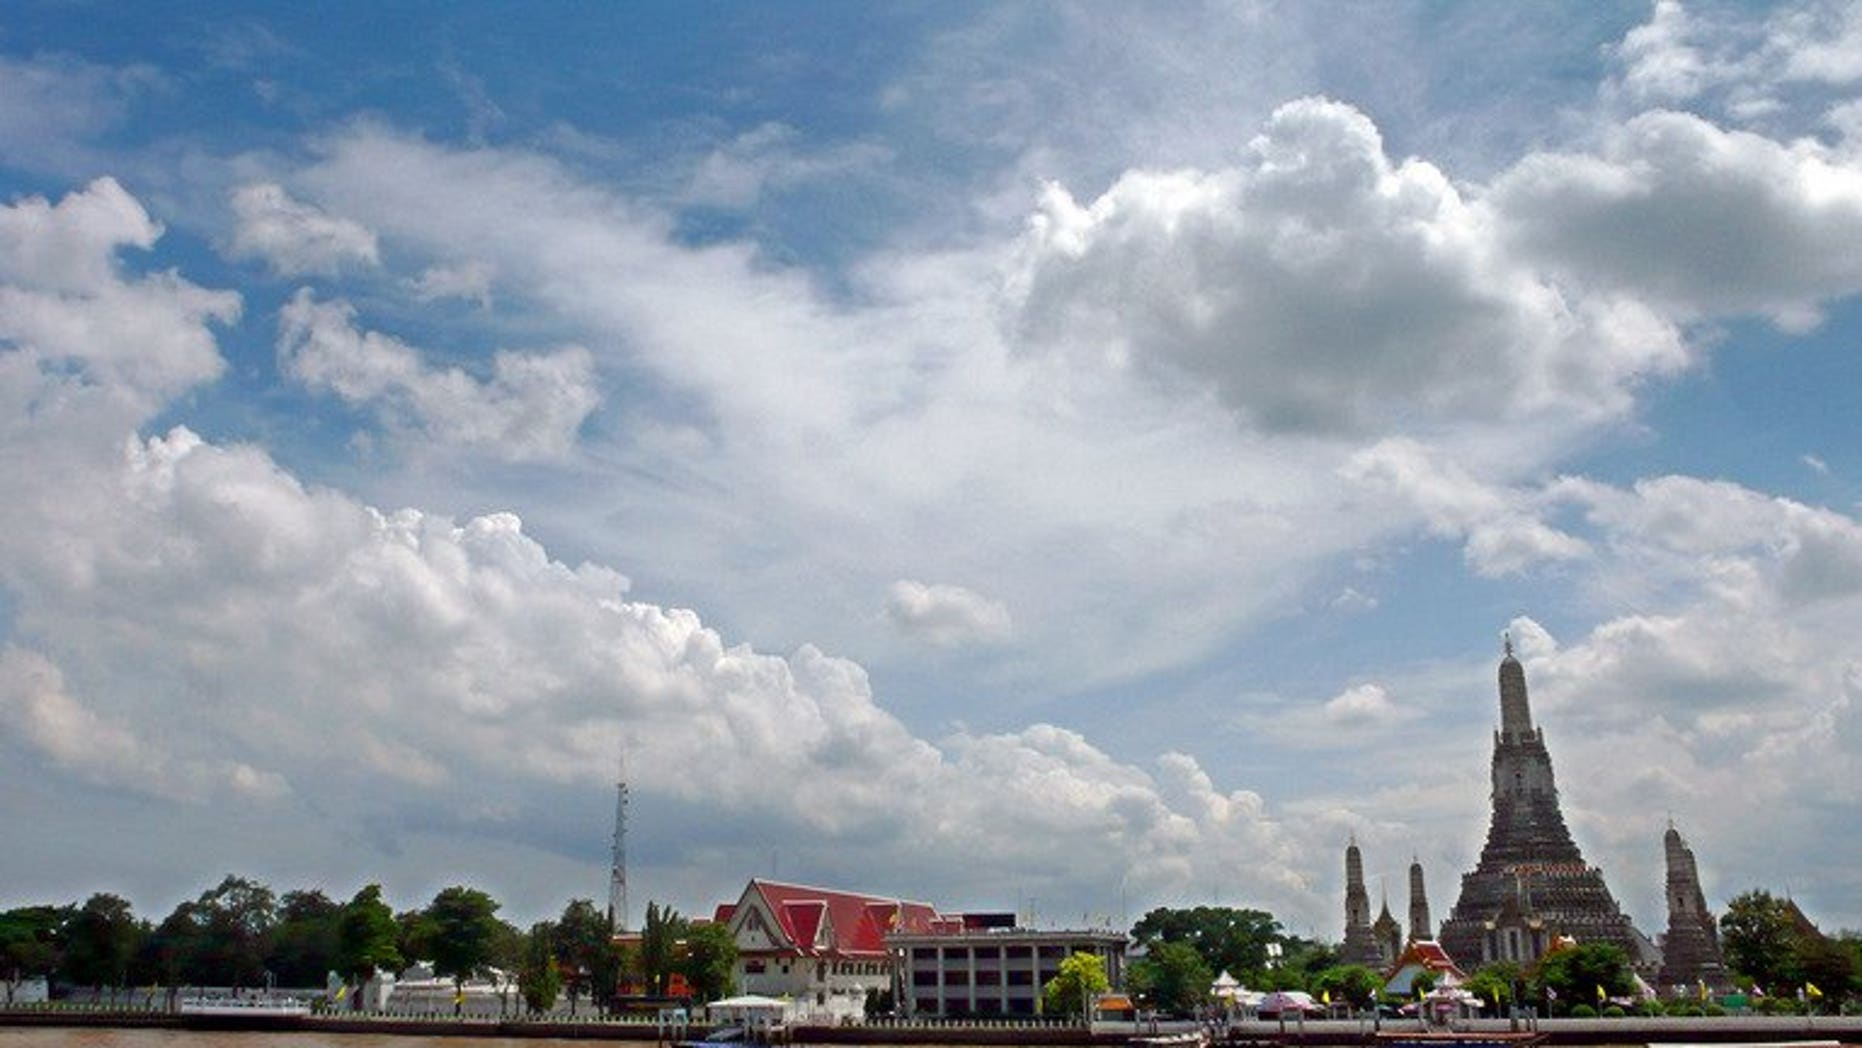 Thai motor boats sail on the Chao Phraya river along Wat Arun Buddhist temple in Bangkok, July 7, 2007.